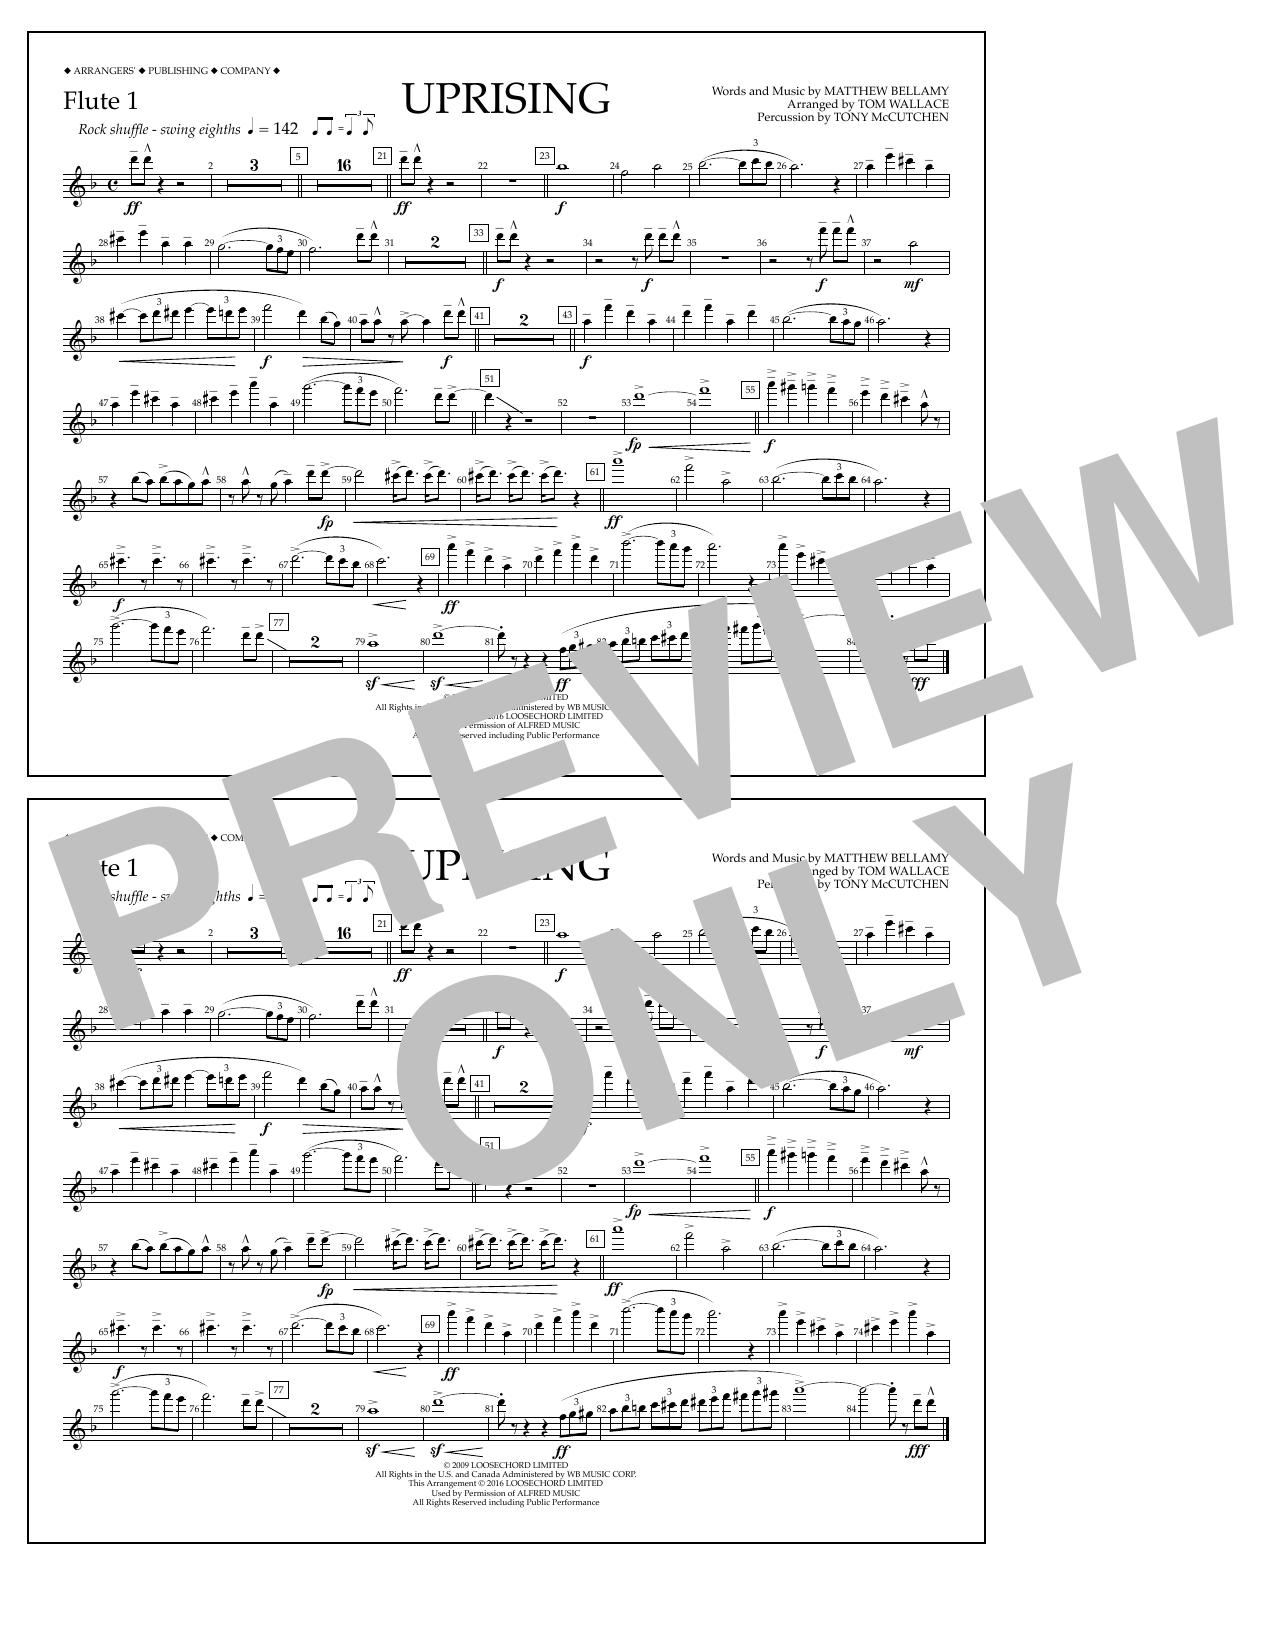 Muse - Uprising - Flute 1